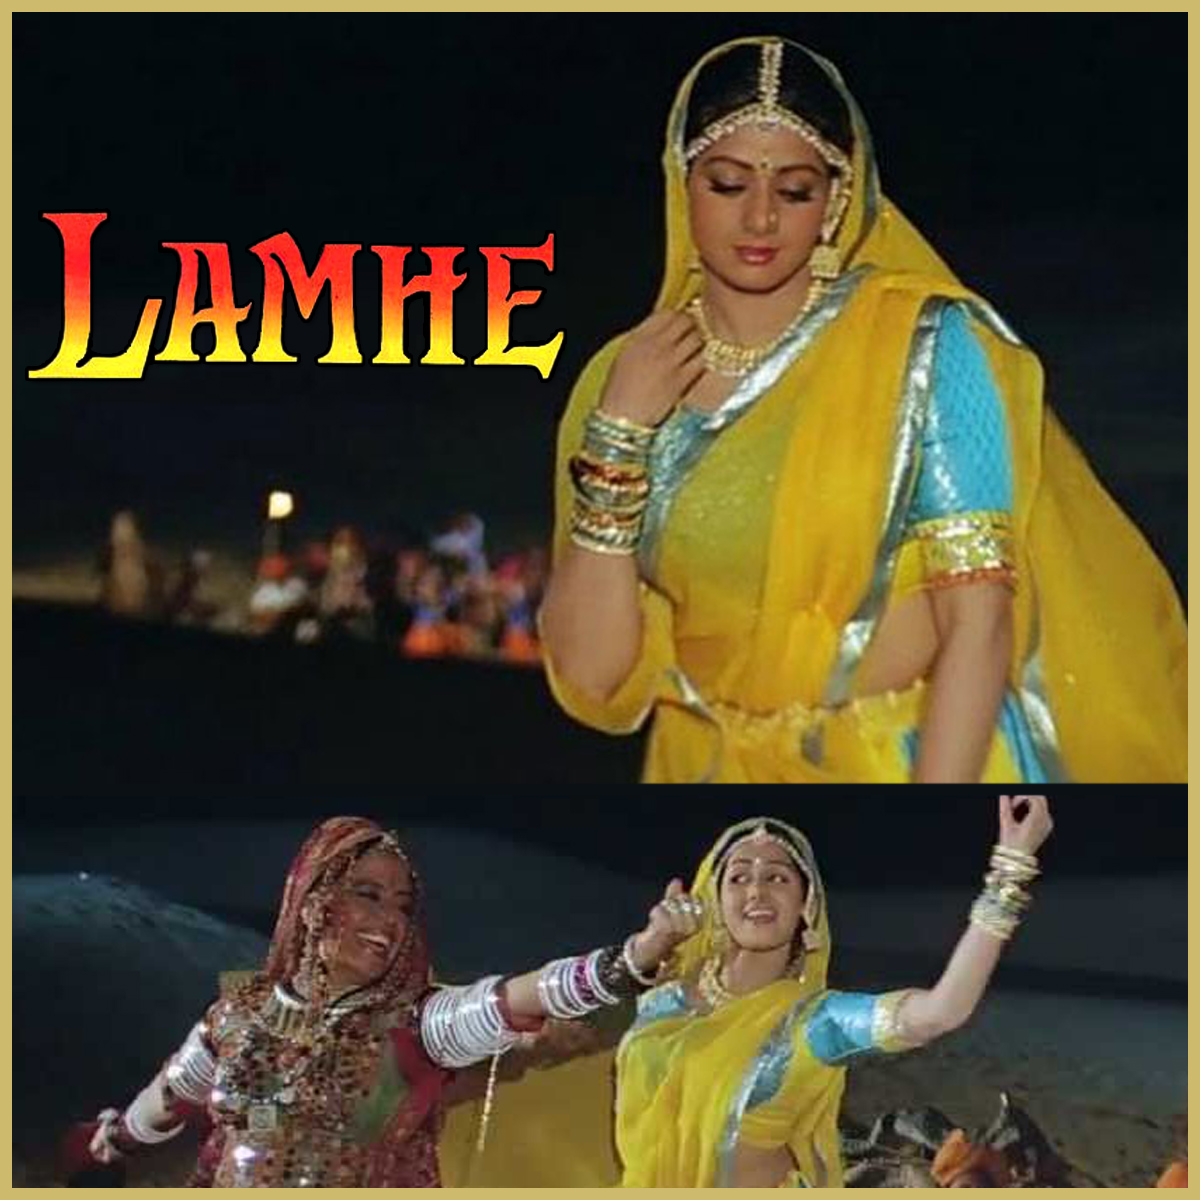 Morni Baga Ma Bole Aadhi Raat Ma Lyrics - Lamhe